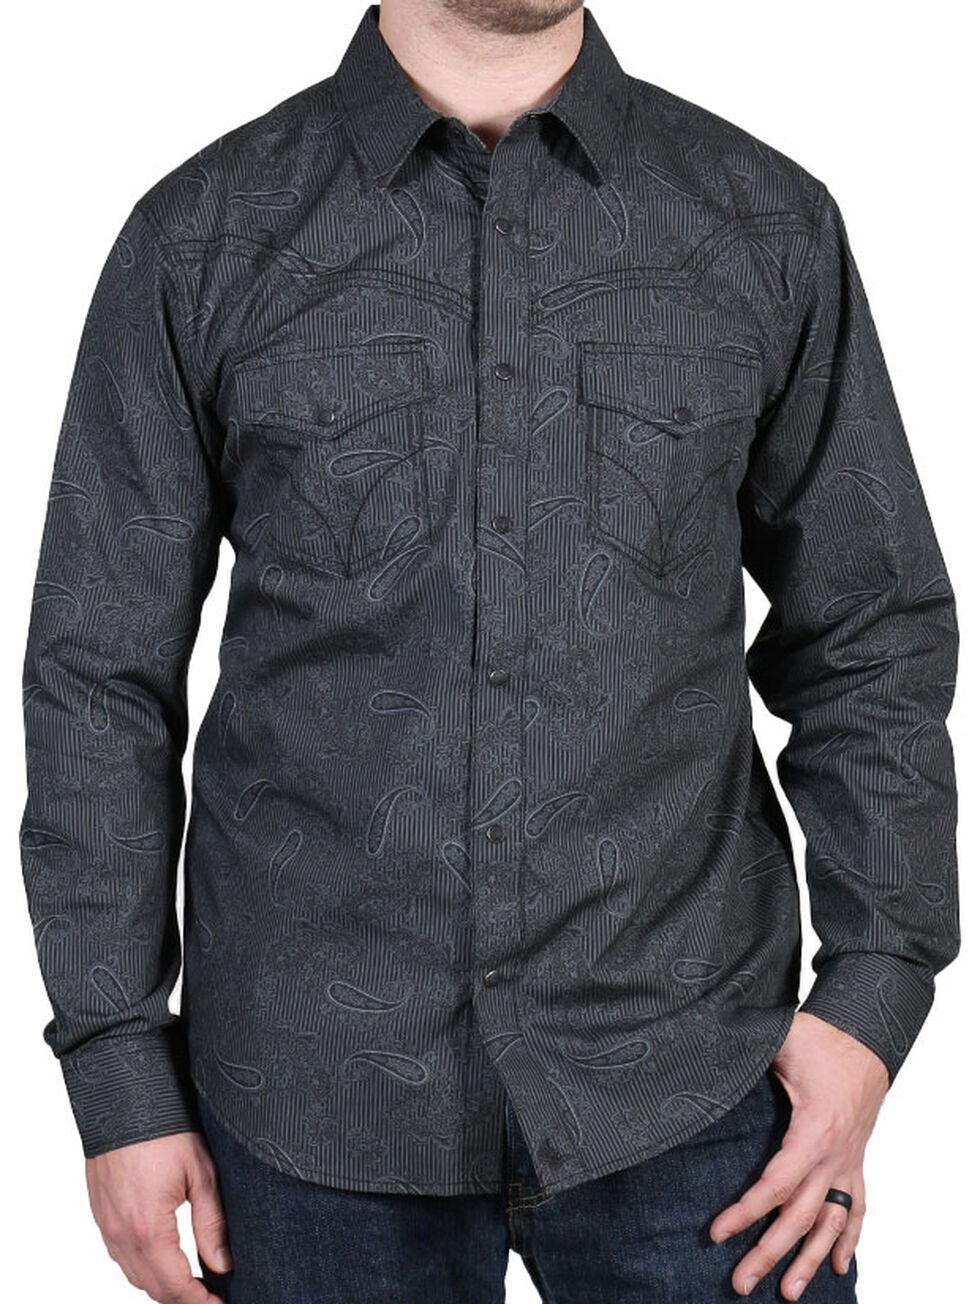 Cody James Men's Deuces Wild Striped Paisley Print Western Shirt, Black, hi-res